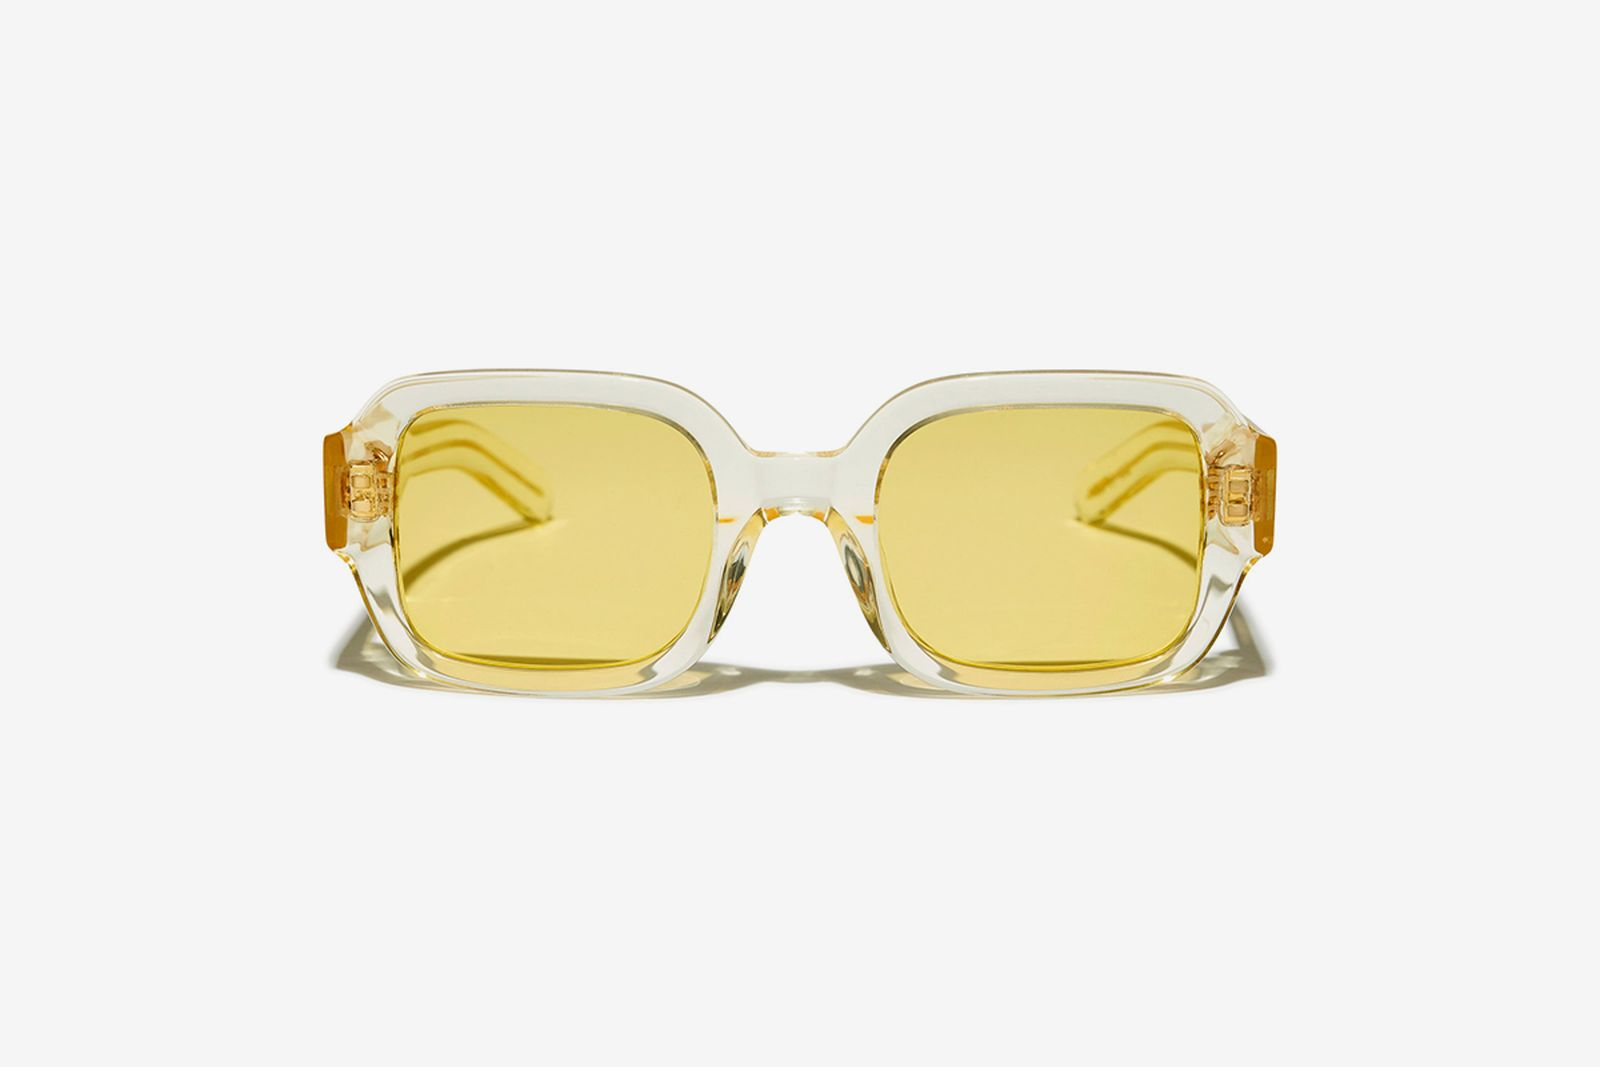 flatlist sunglasses main1 LUISAVIAROMA